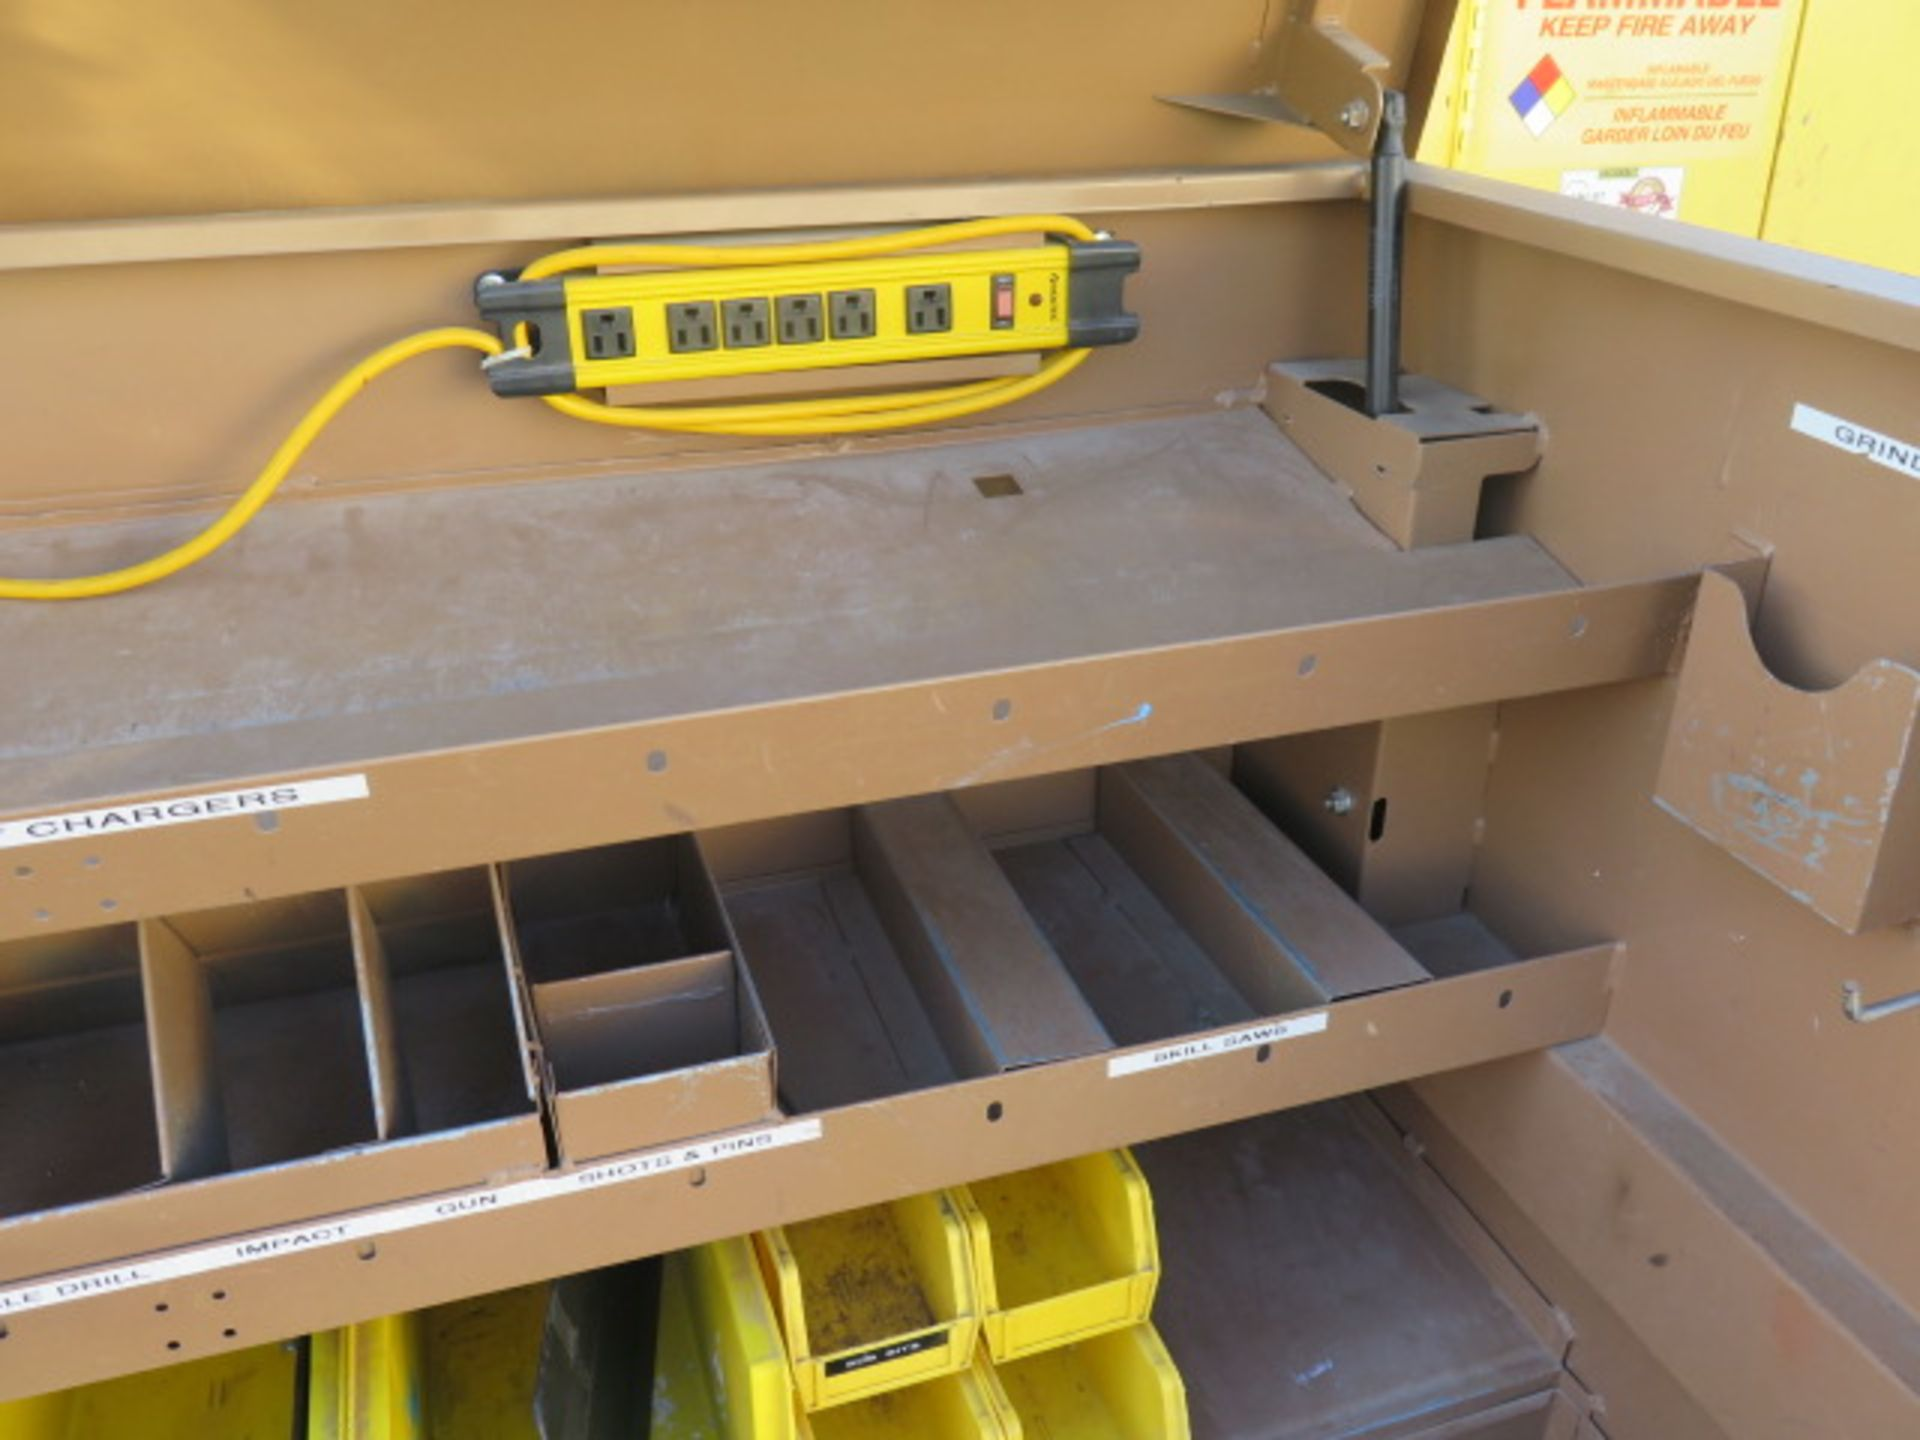 Knaack mdl. 89 Storagemaster Rolling Job Box (SOLD AS-IS - NO WARRANTY) - Image 6 of 12